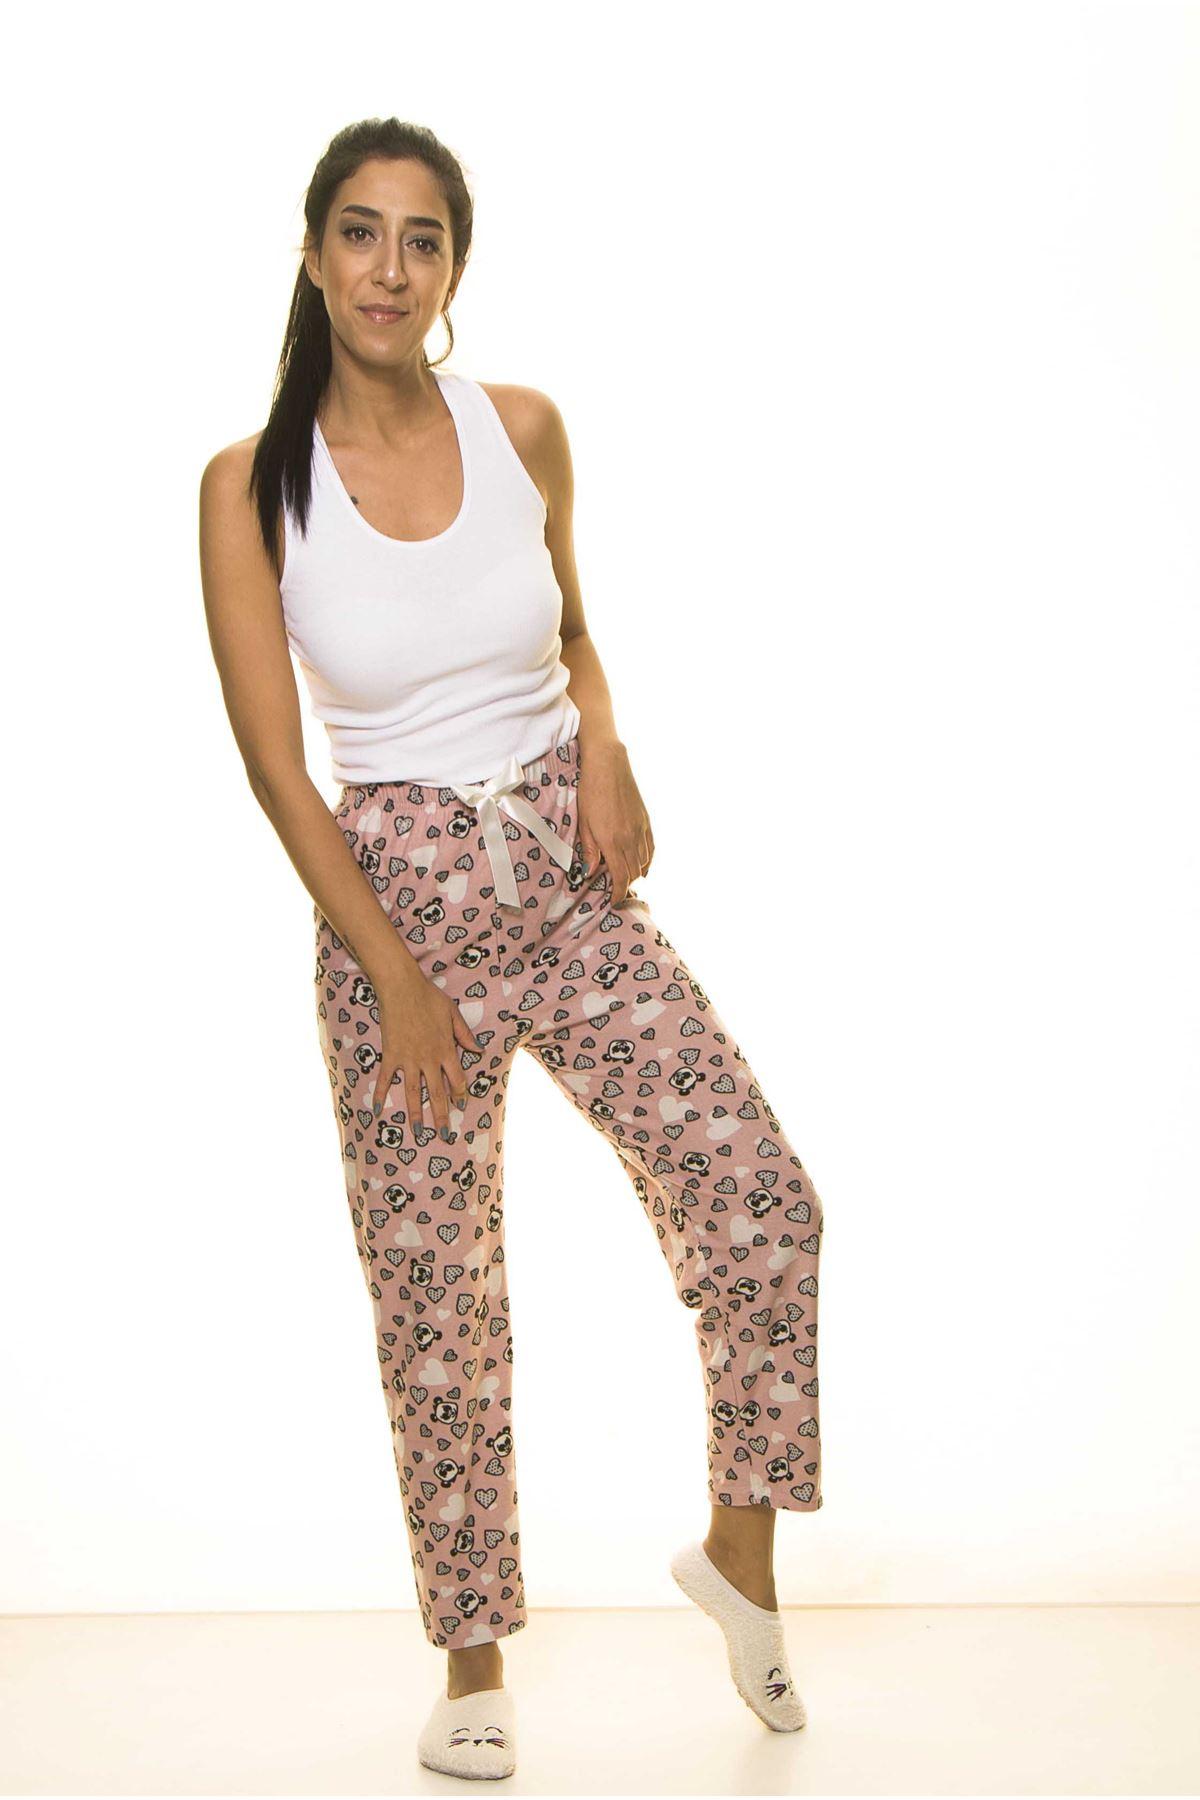 Pembe Sevimli Yumuşak Süet Penye Ev Pijama Altı 9C-2059P